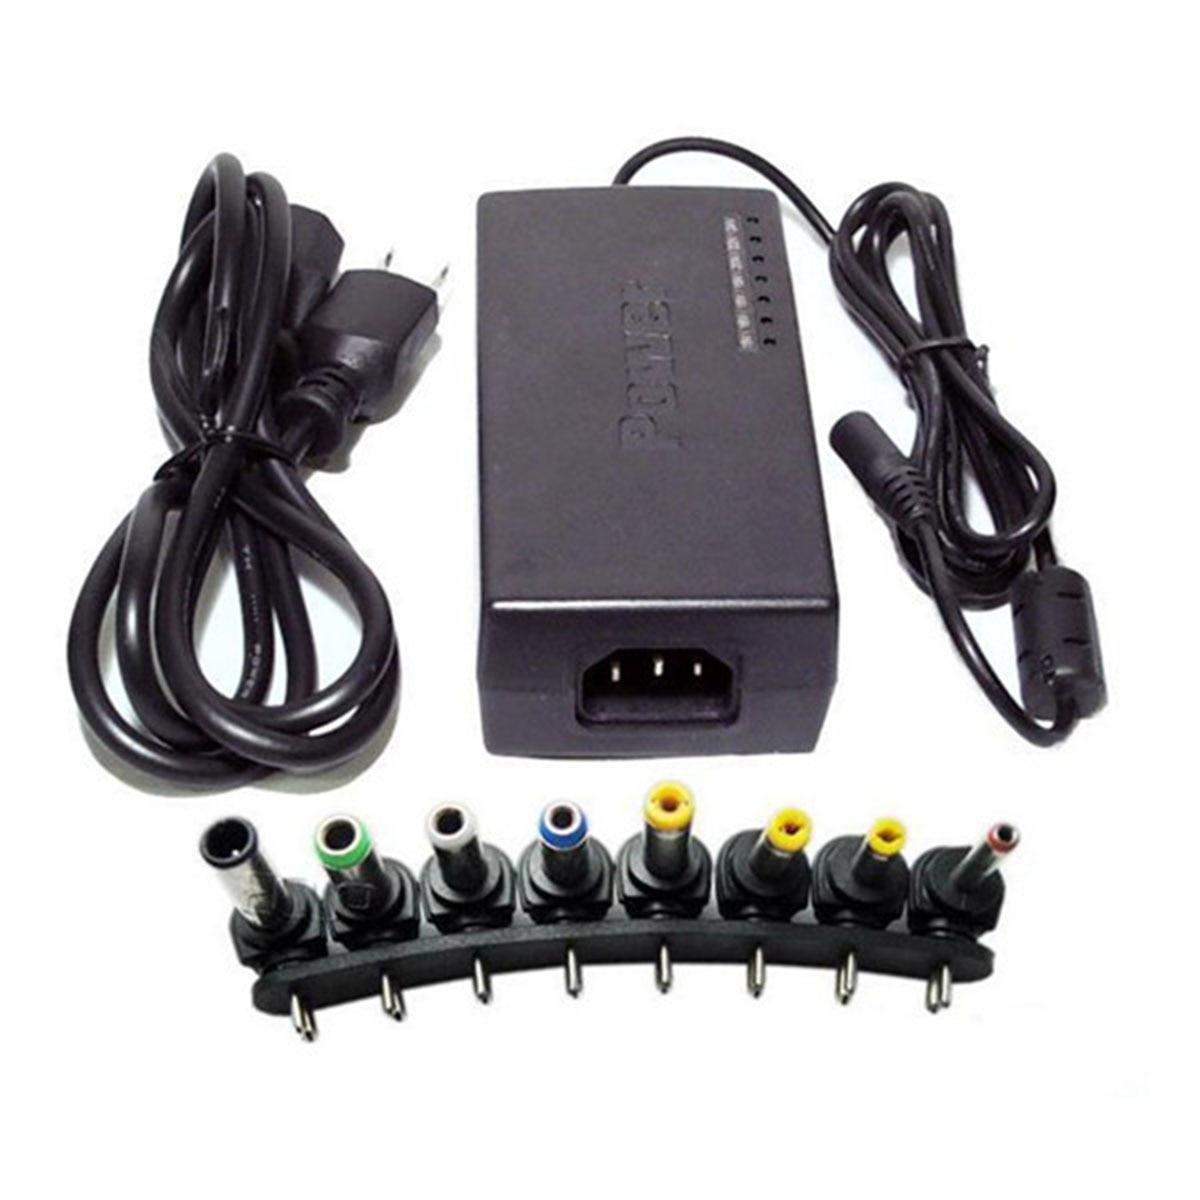 96W Multi-Funktion Universal AC DC Power Adapter Ladegerät 12 V-24 V Einstellbar Für Notebook Laptop